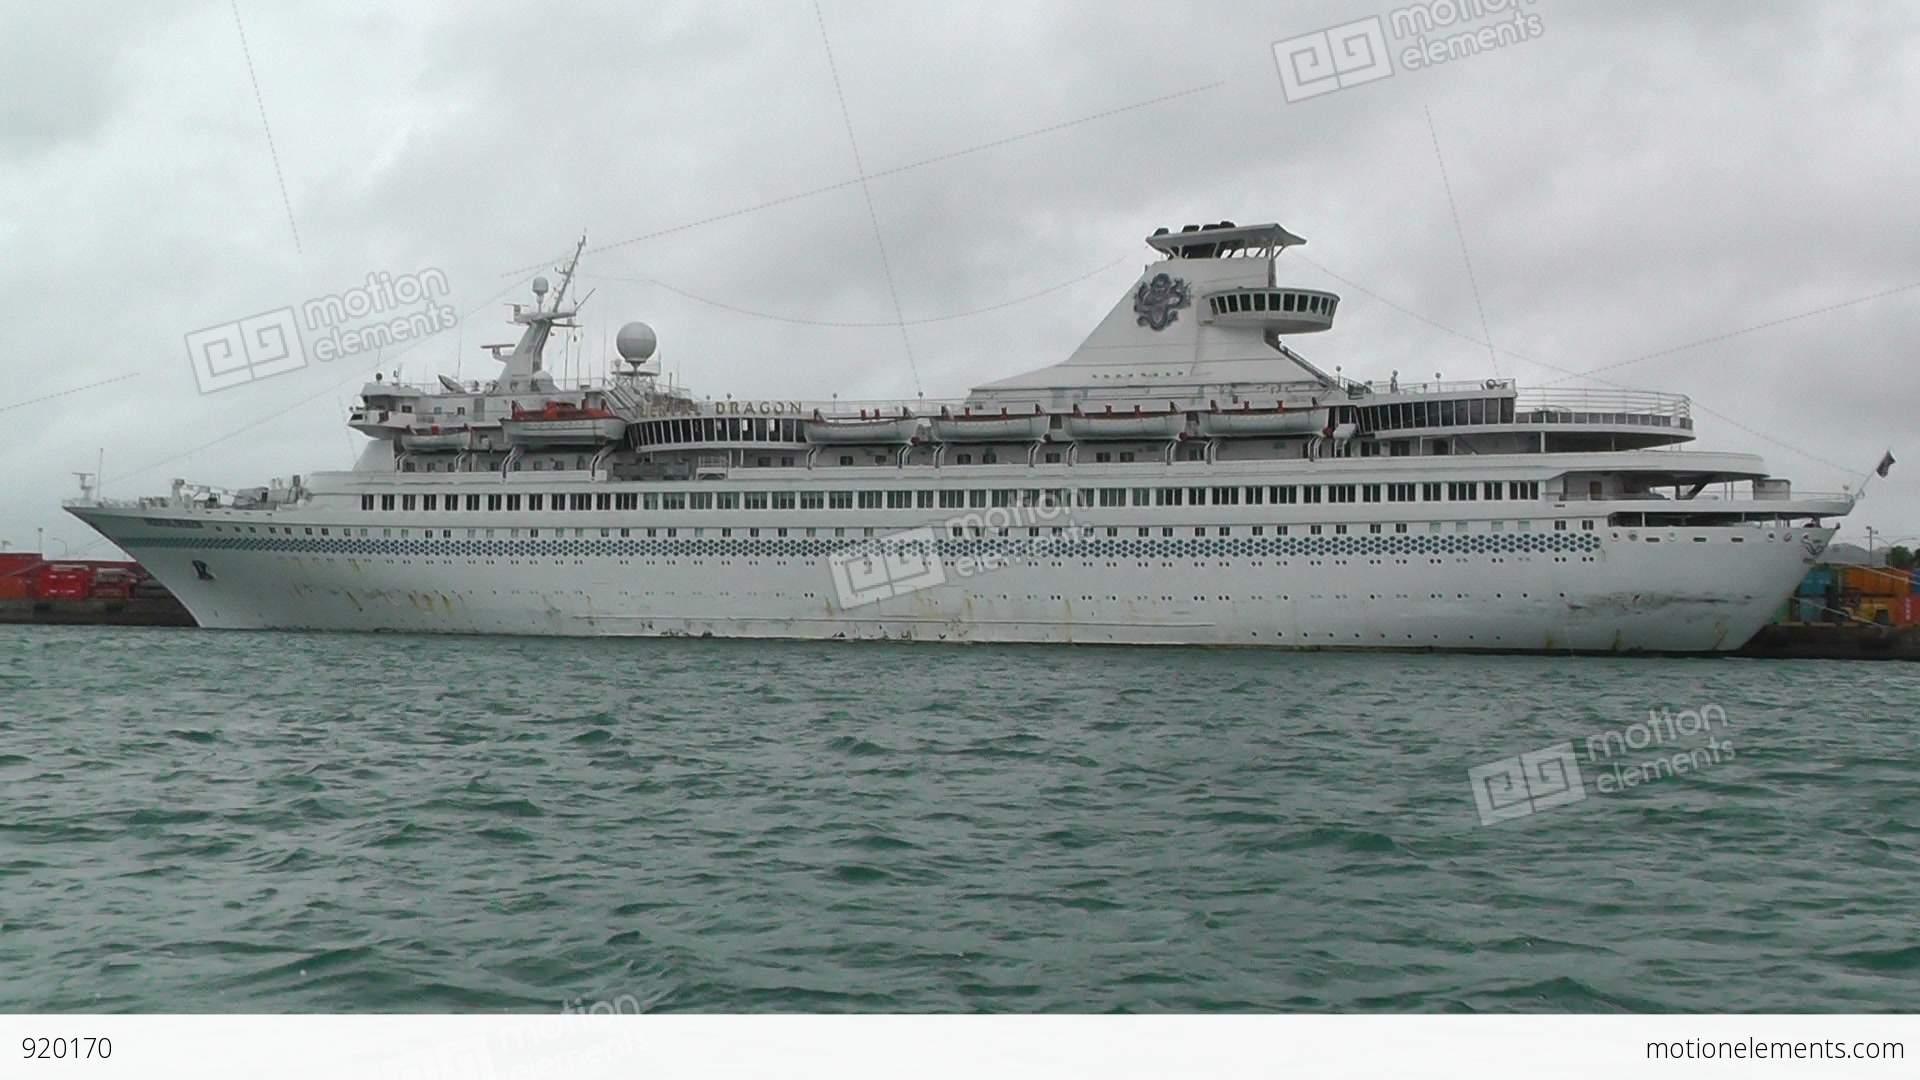 Leaving Port Okinawa Islands Cruise Ship Tracking Shot Fps - Cruise ship location tracker